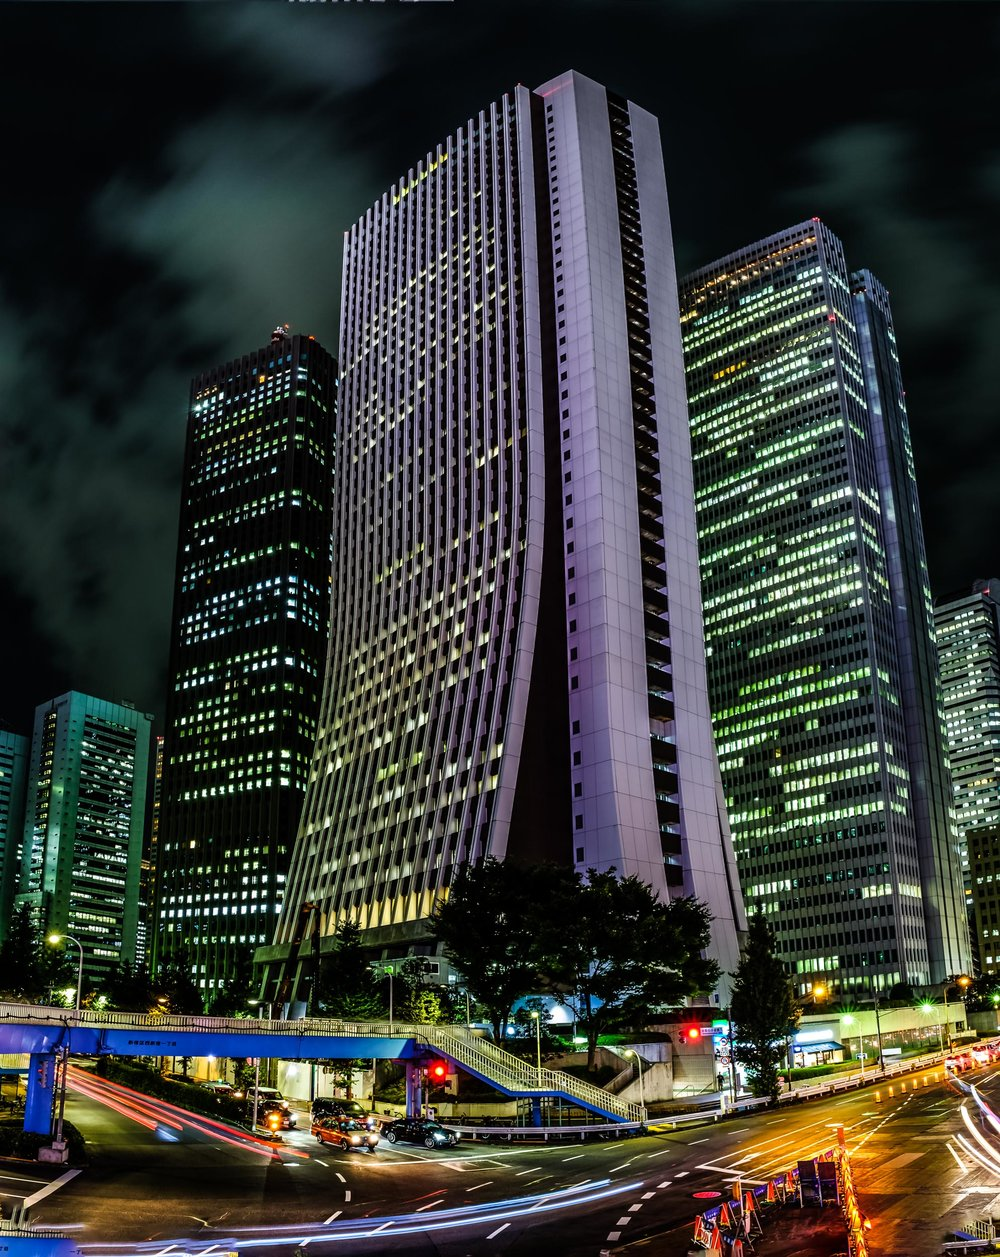 The Sonpo Japan building in Nishi-Shinjuku, Tokyo